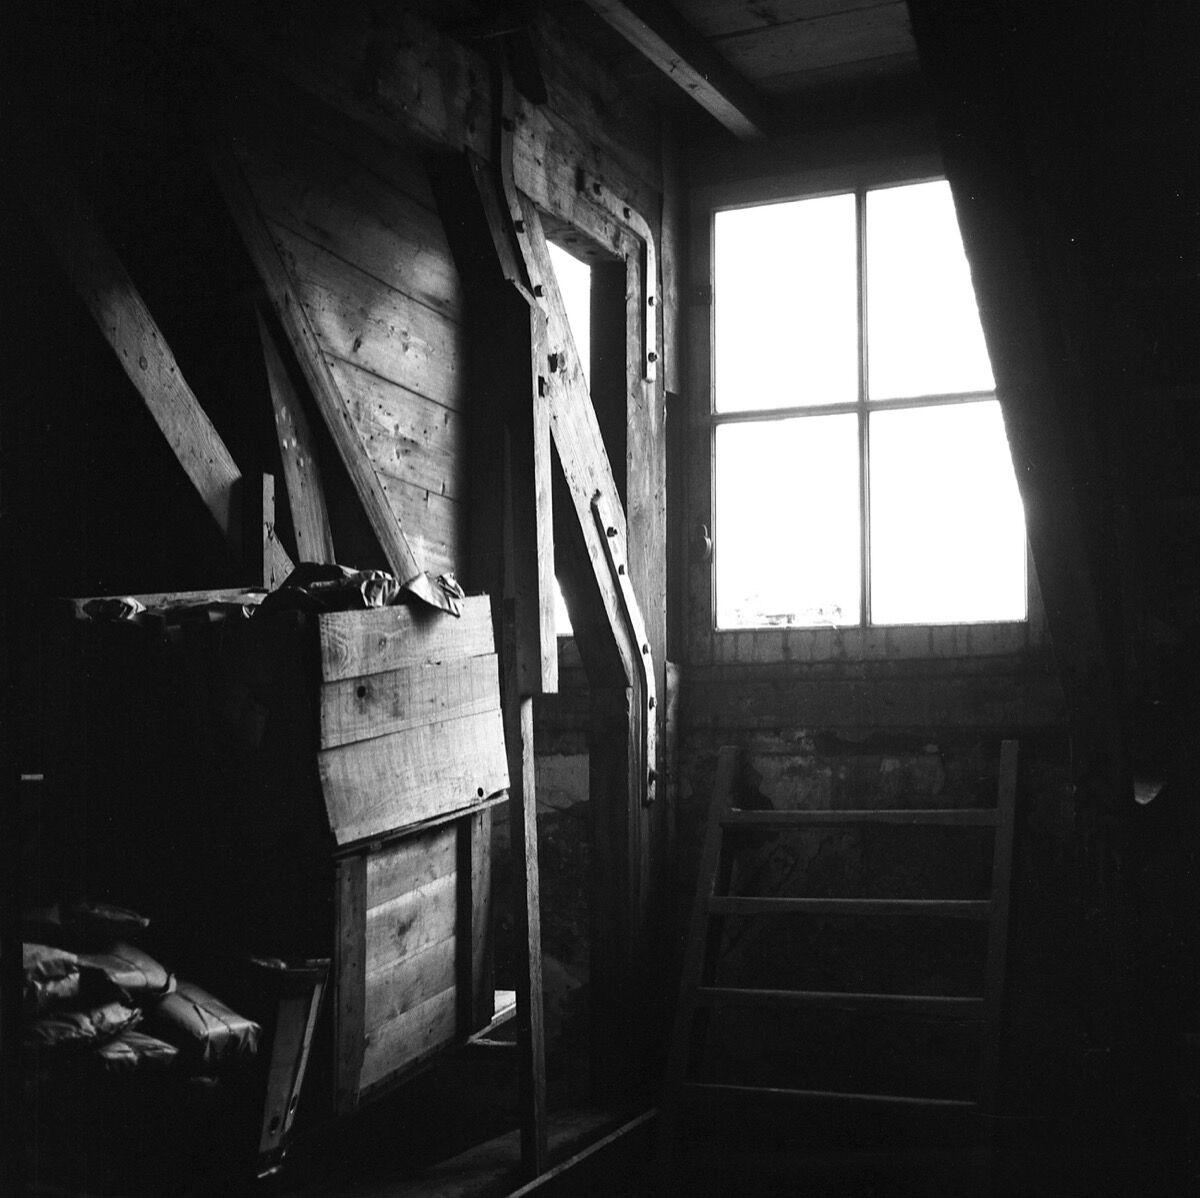 Maria Austria, The attic of the Secret Annex, 1954. © Maria Austria / MAI. Courtesy of the Jewish Historical Museum, Amsterdam.